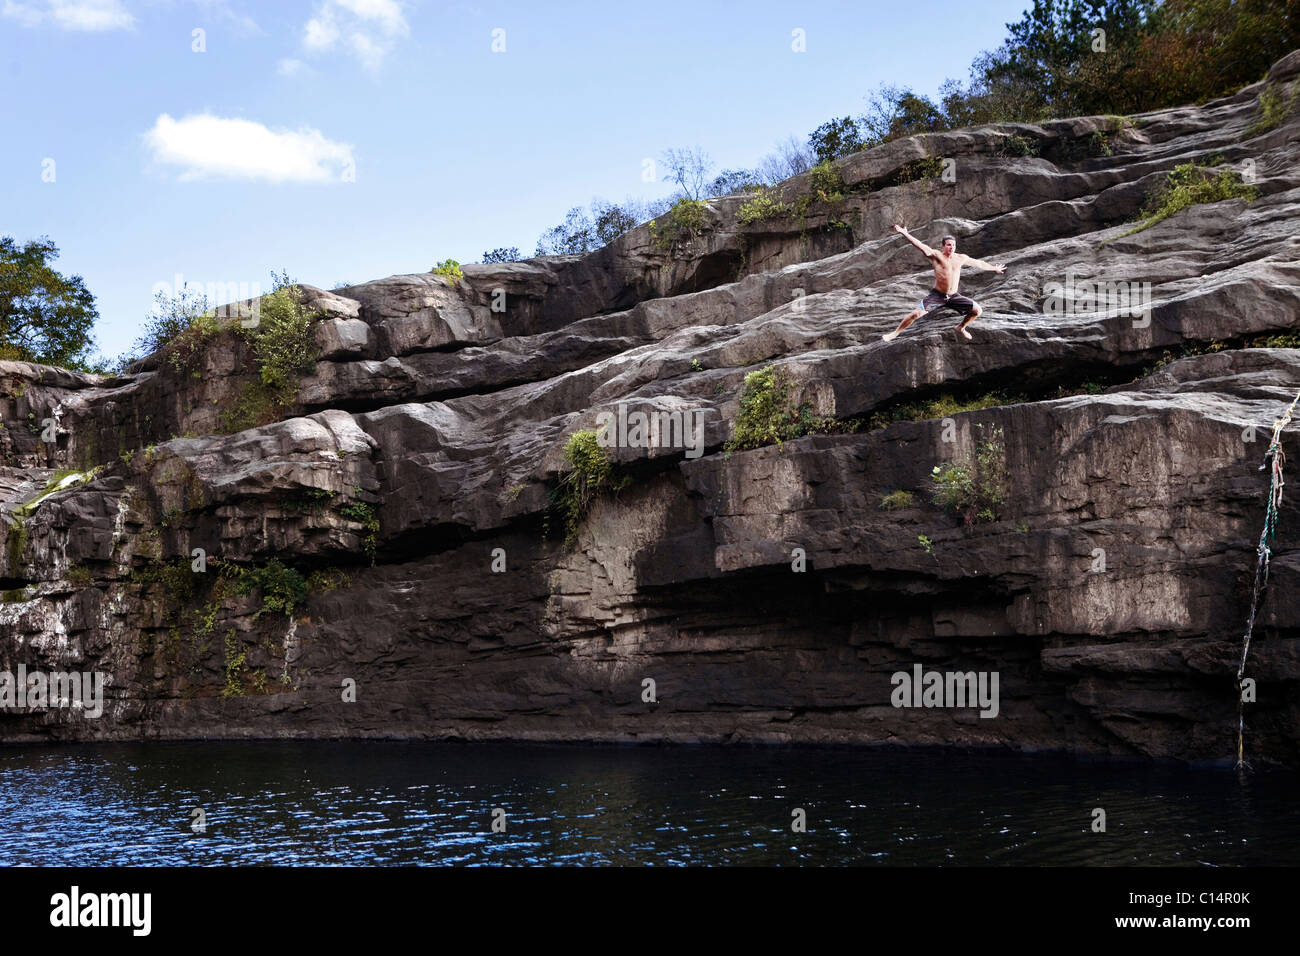 Young man jumps off rock cliffs into a lagoon at High Falls Park, Geraldine, Alabama. - Stock Image